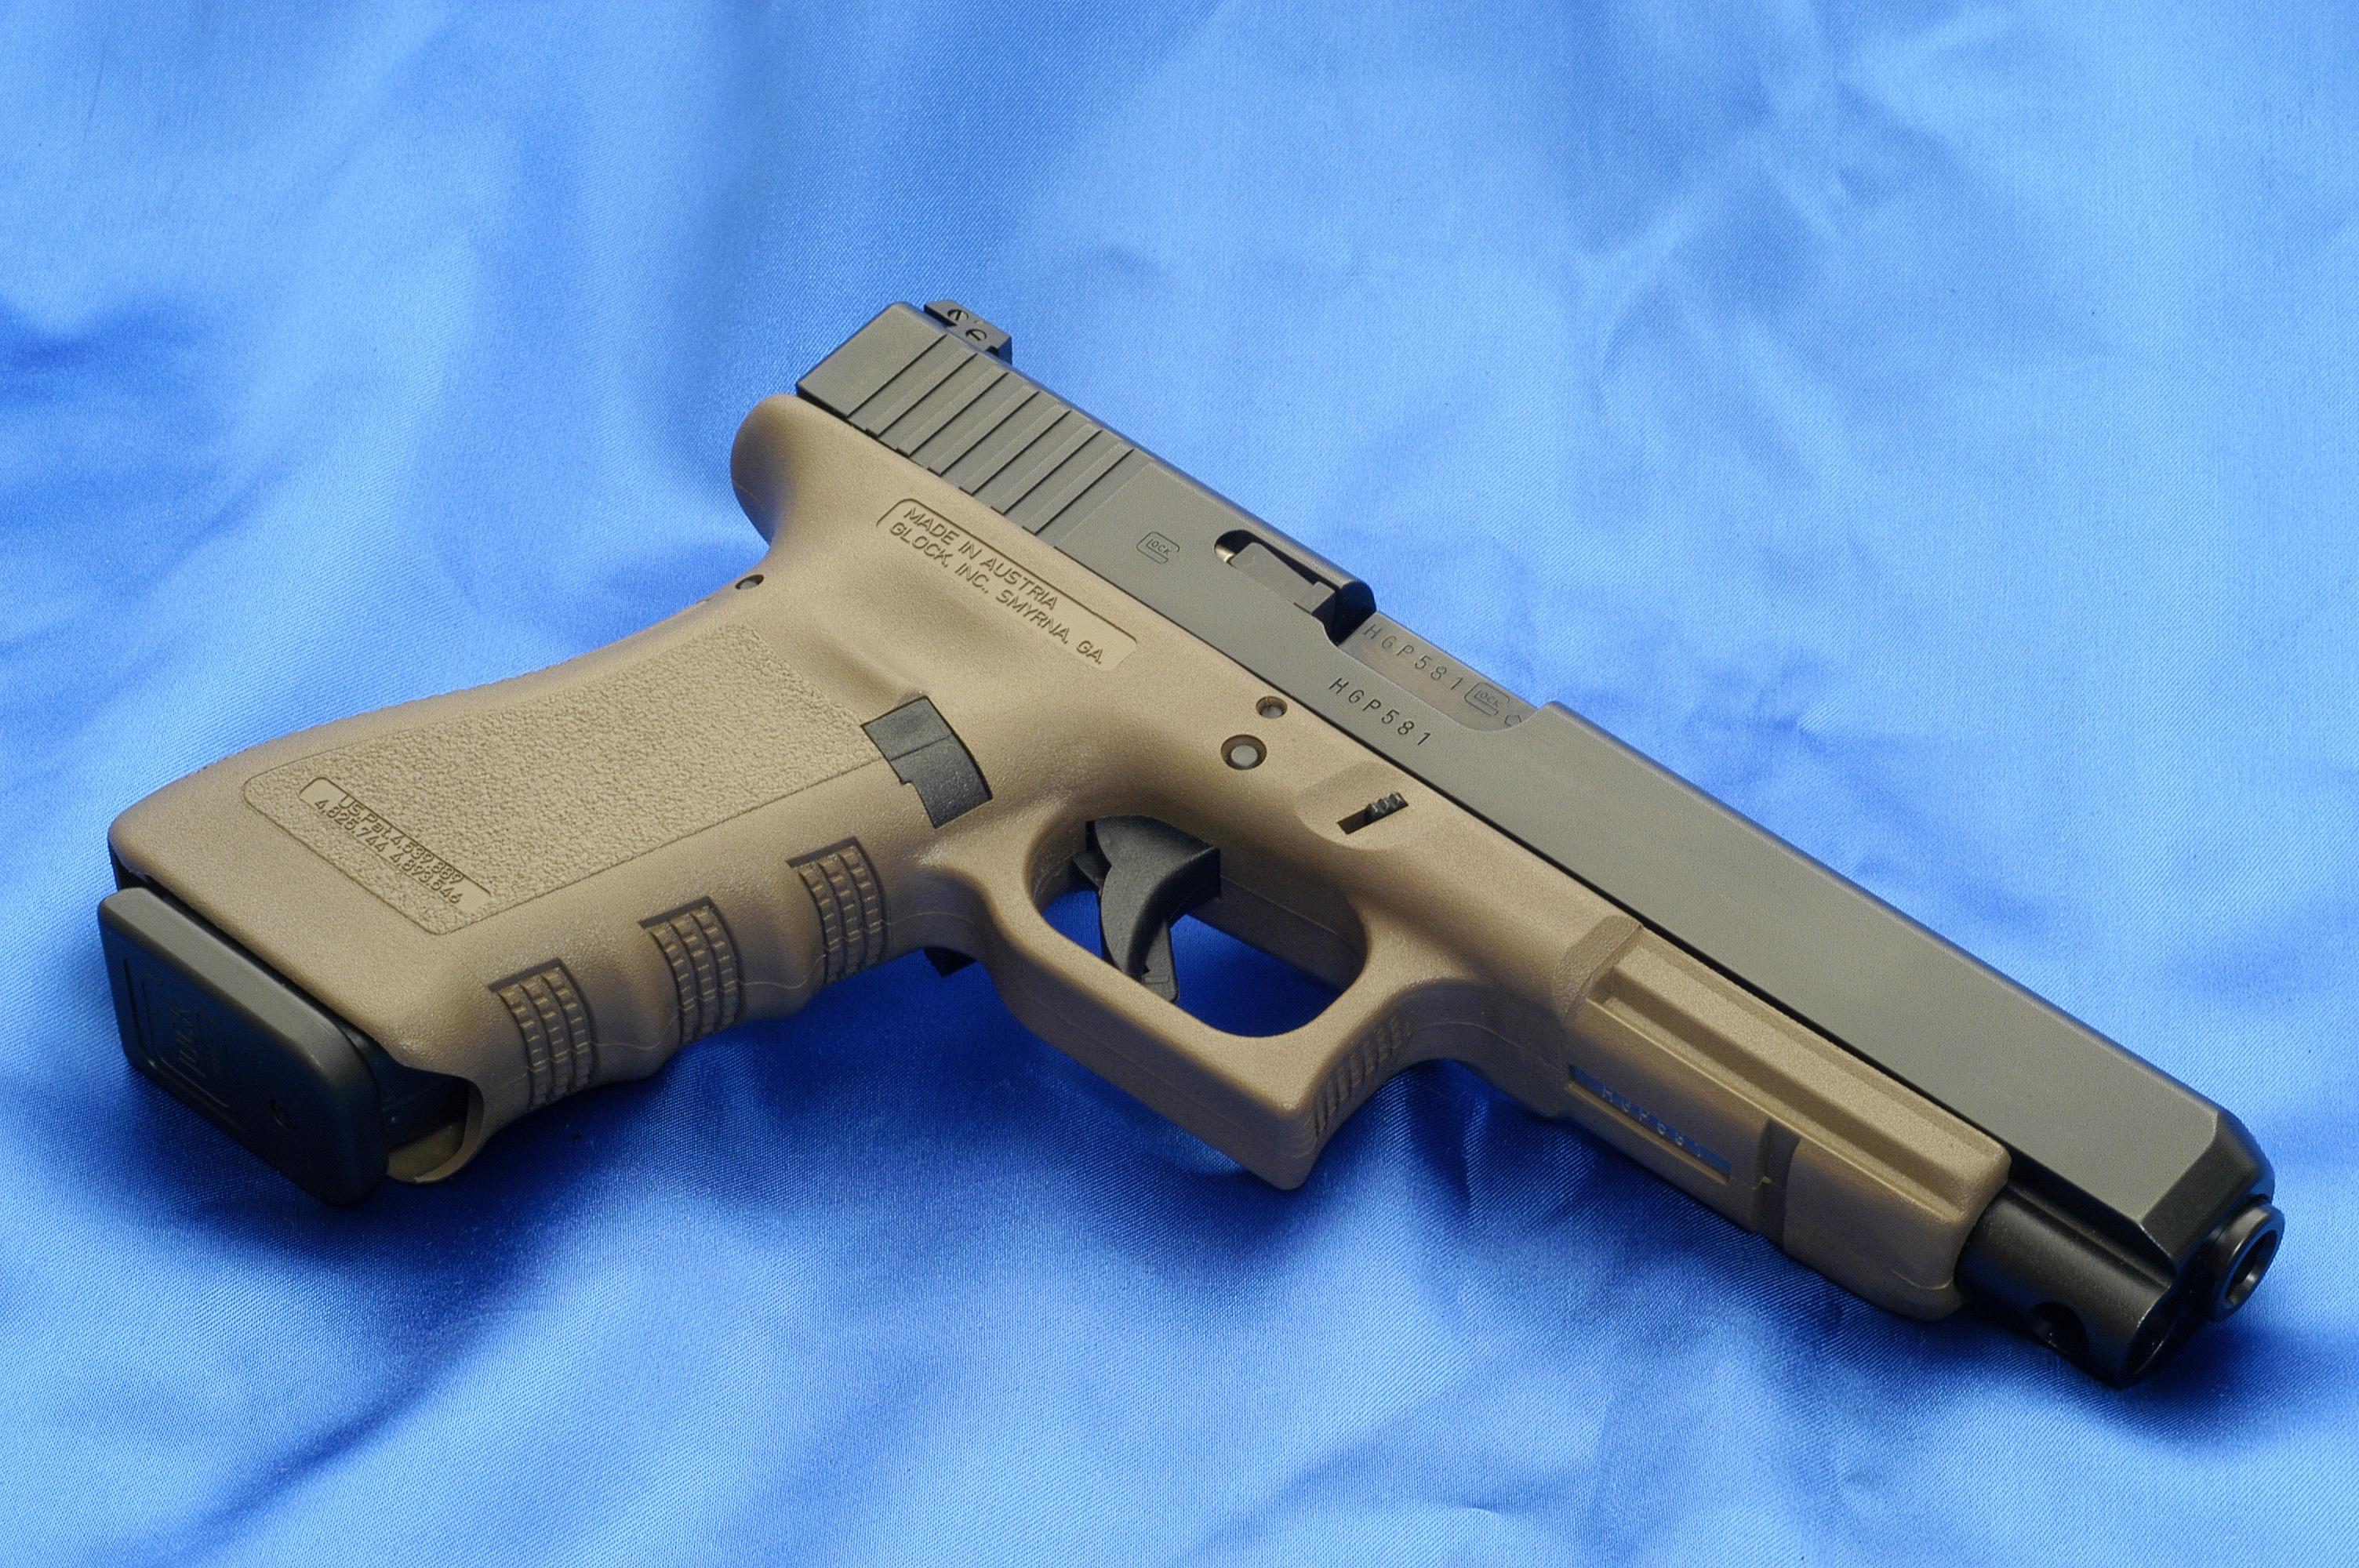 Glock pistol hd wallpaper background image 3008x2000 - Glock wallpaper ...